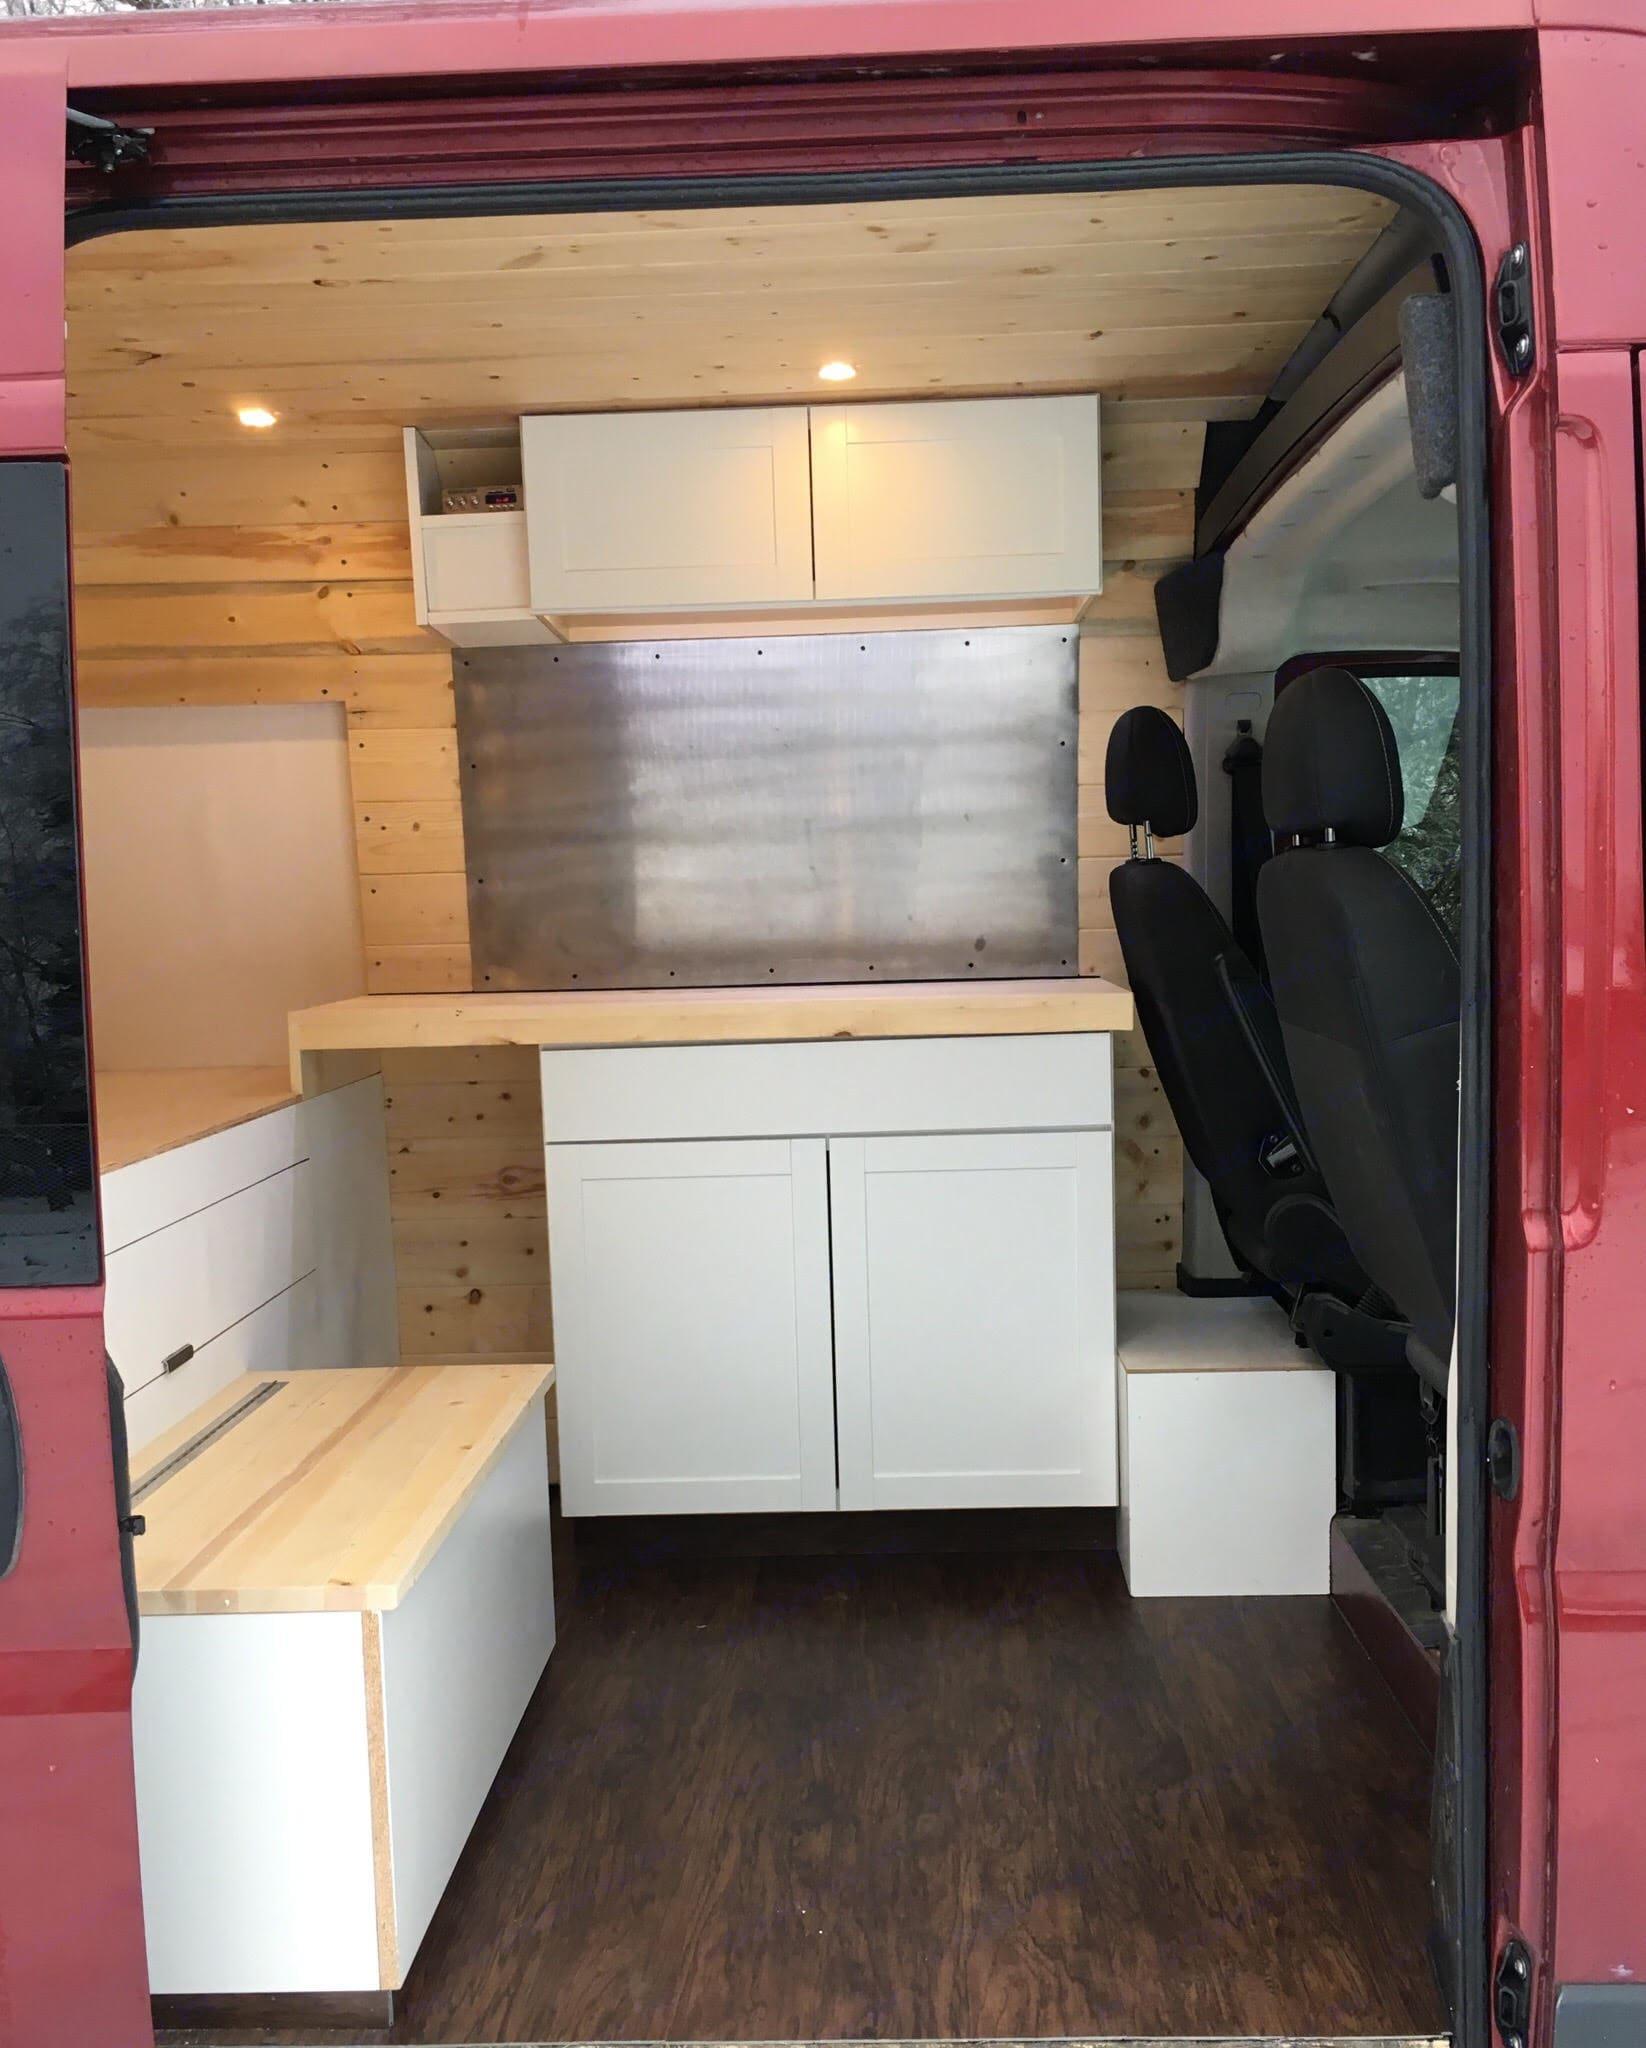 Kitchen setup. Ram Promaster 1500 2016